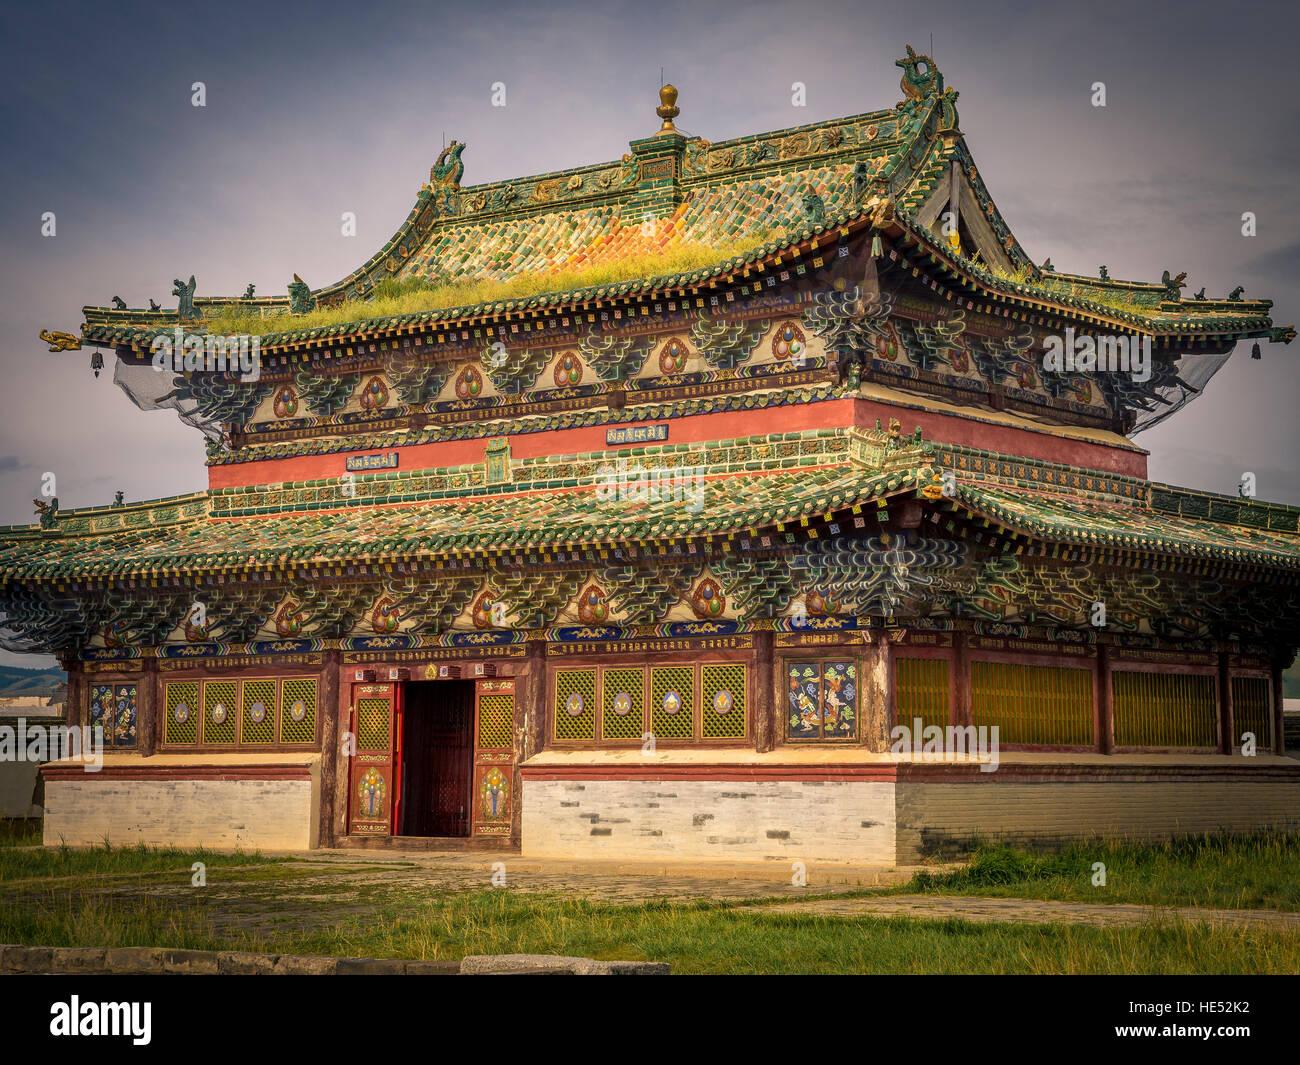 Tempel im Kloster Erdene Zuu, Karakorum, Kharkhorin, Övörkhangai Provinz, Mongolei Stockbild